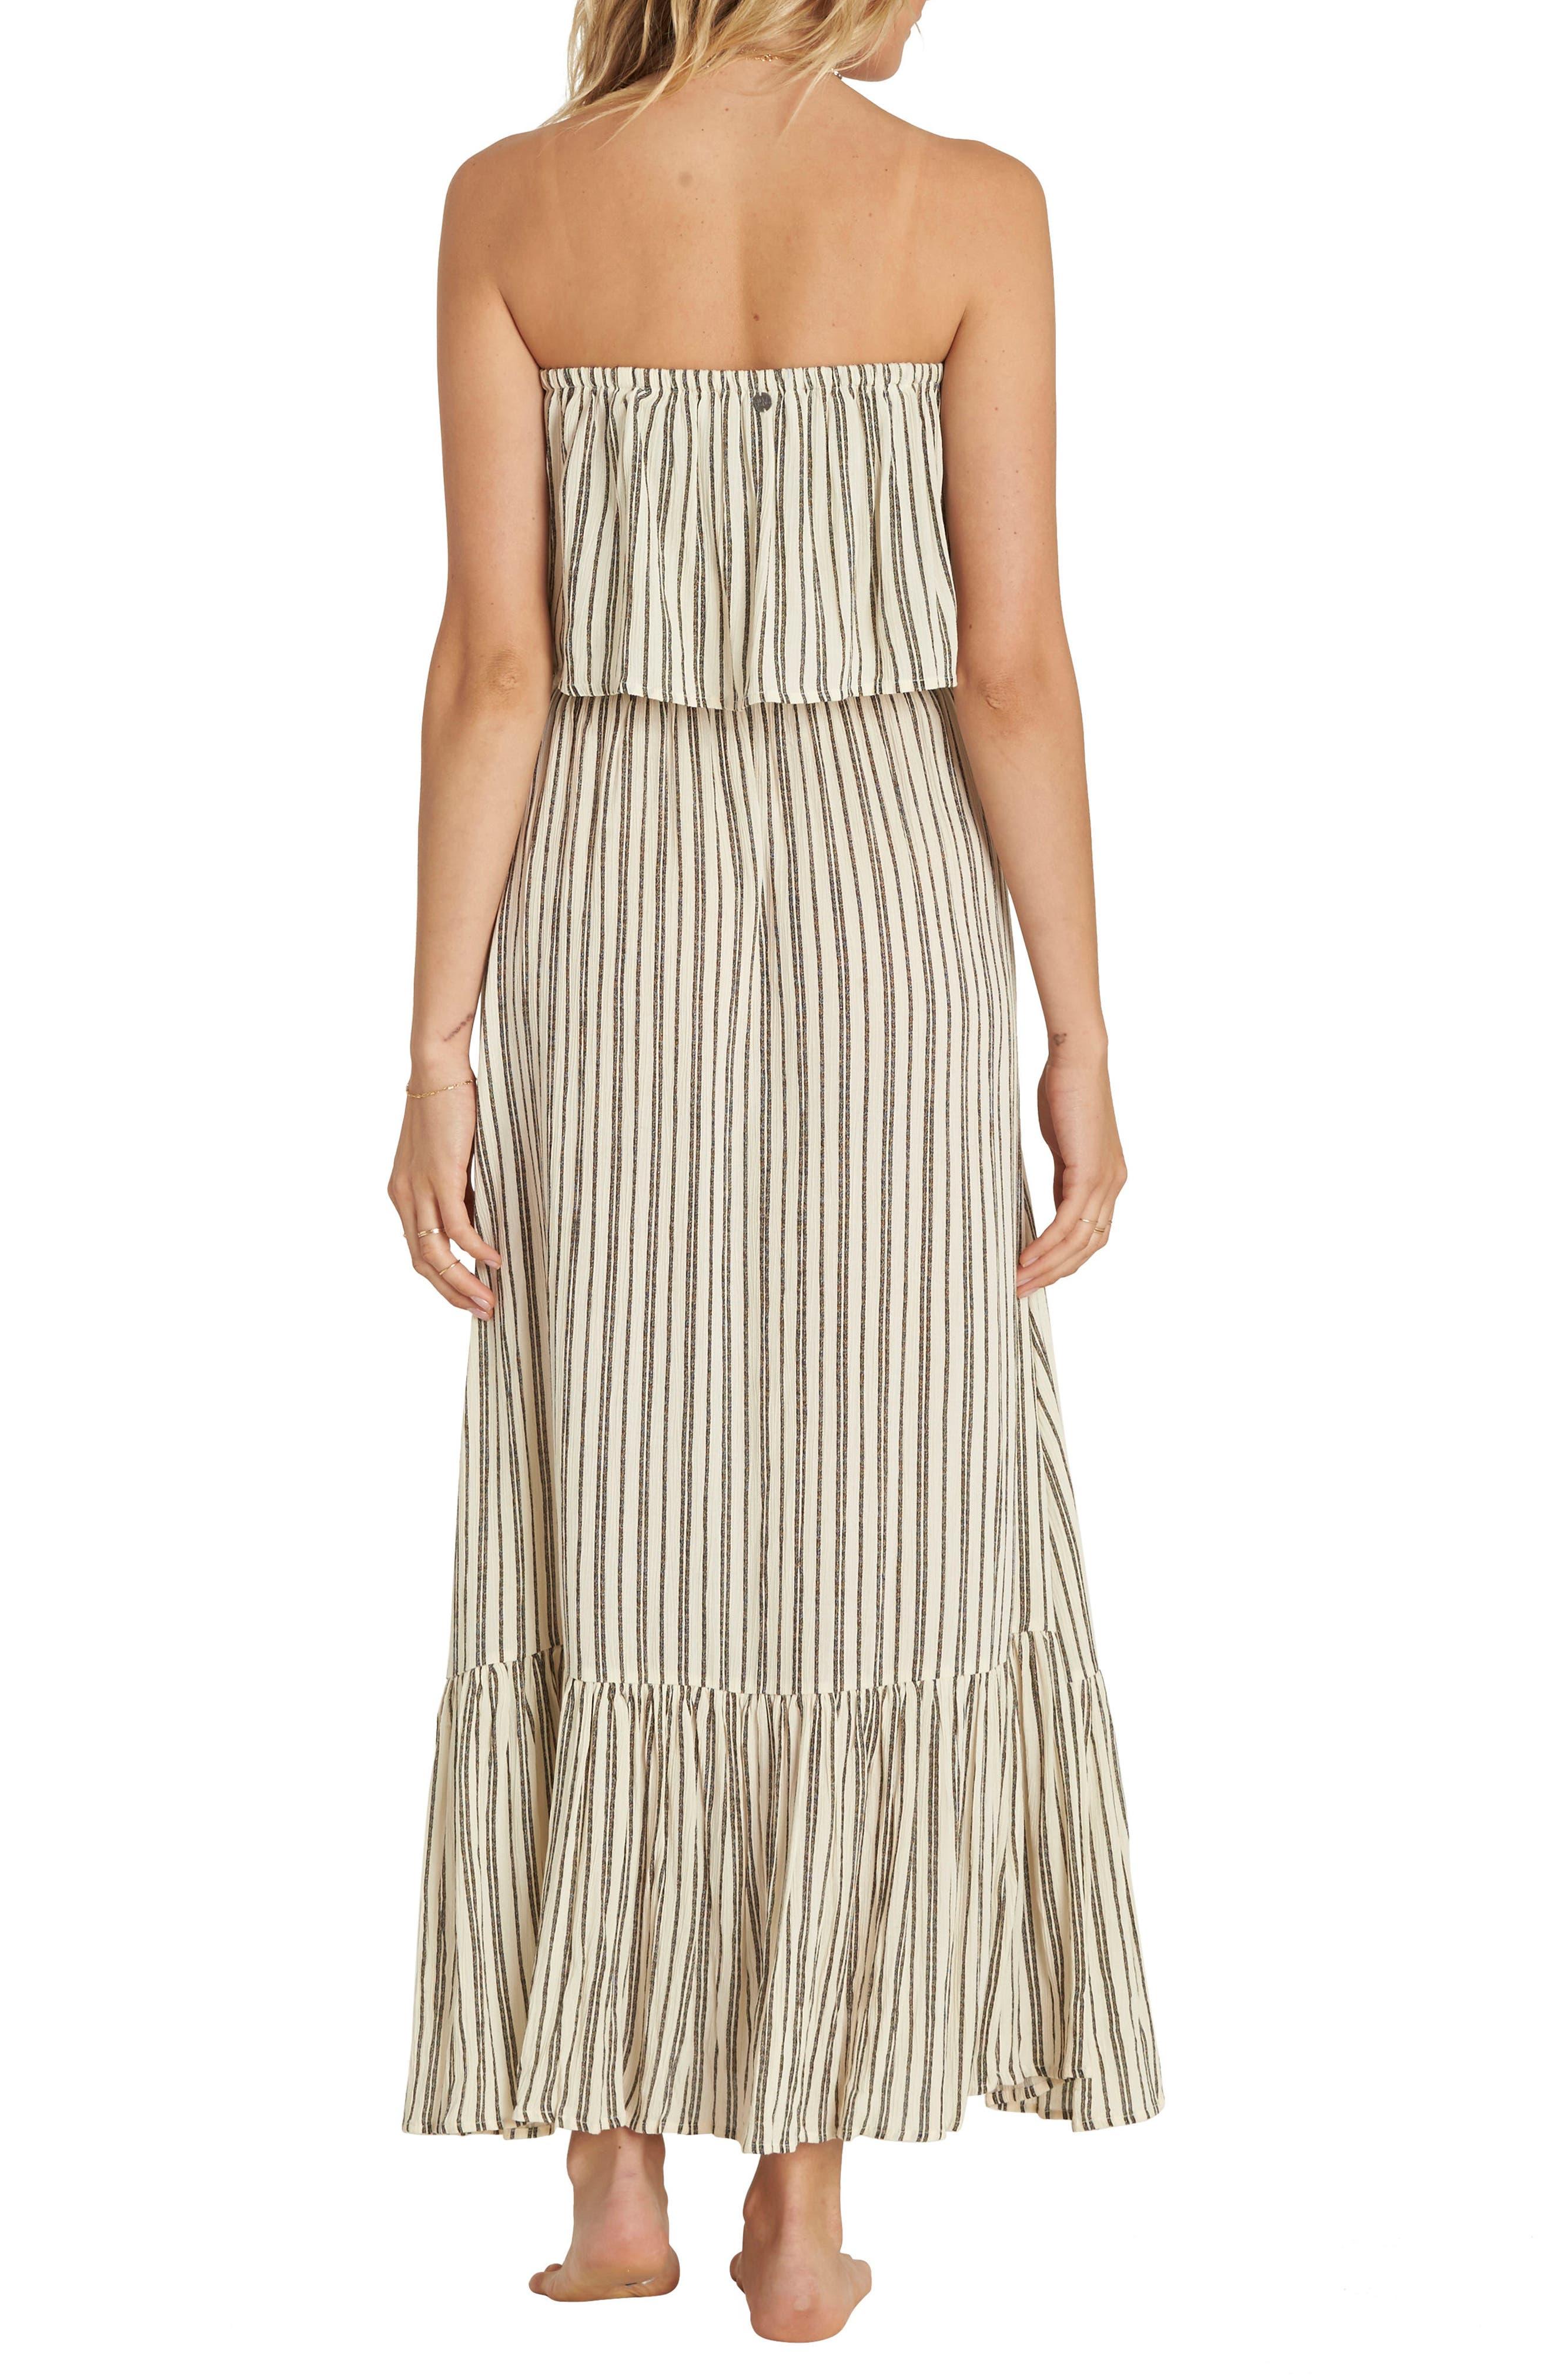 Island Vibes Strapless Maxi Dress,                             Alternate thumbnail 2, color,                             White Cap